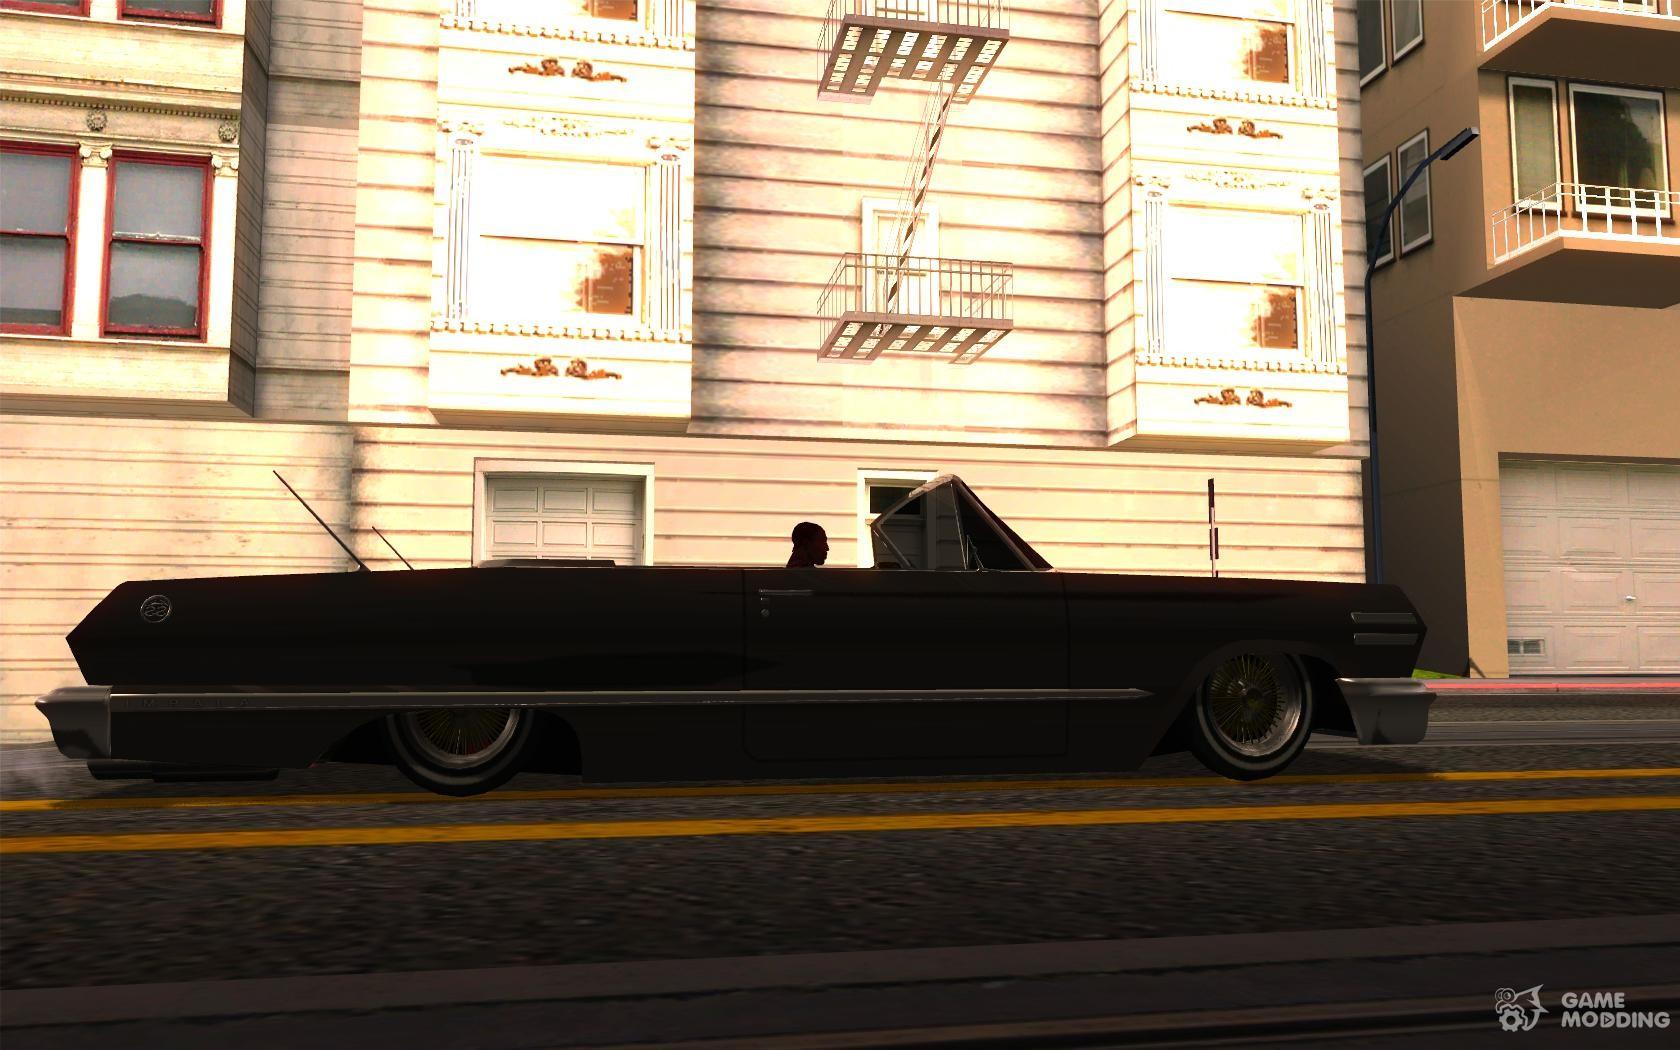 Chevrolet impala 4 door hardtop 1963 for gta san andreas - Chevrolet Impala 1963 Lowrider For Gta San Andreas Inside View